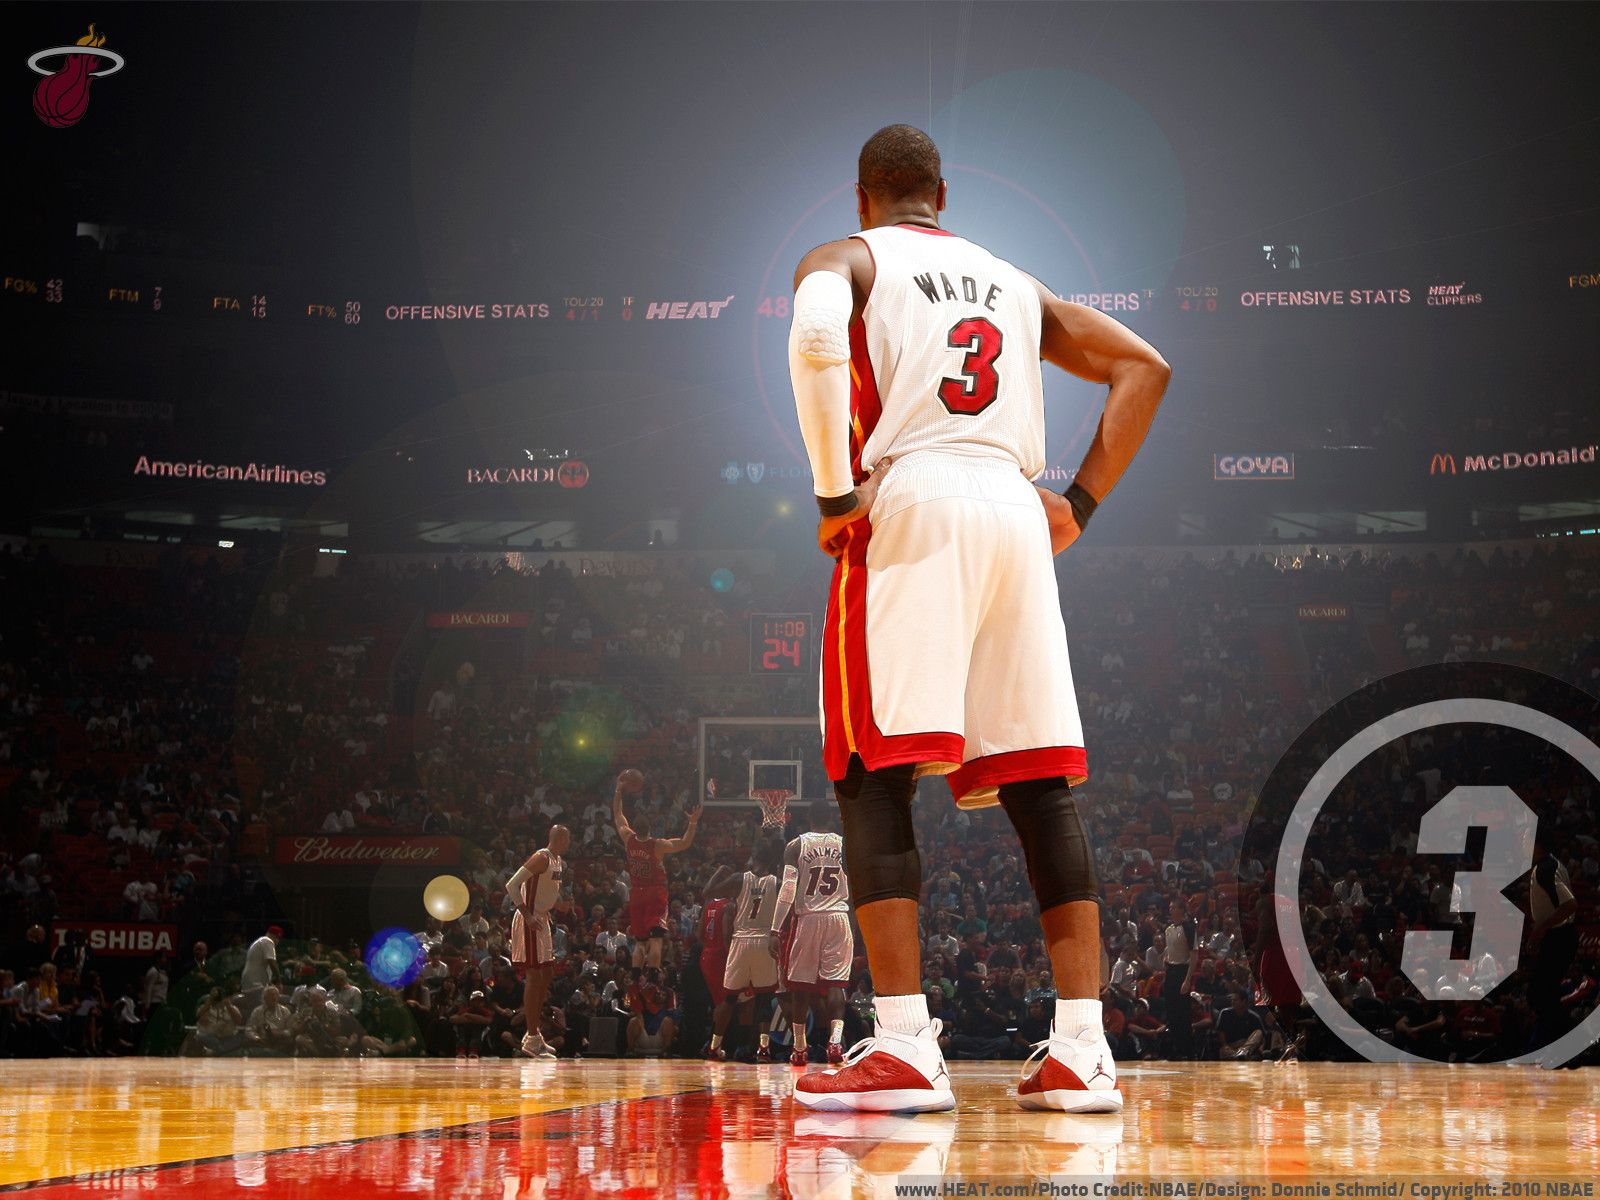 Kobe Bryant Quotes Wallpaper Hd Dwyane Wade Wallpapers Free Download Pixelstalk Net